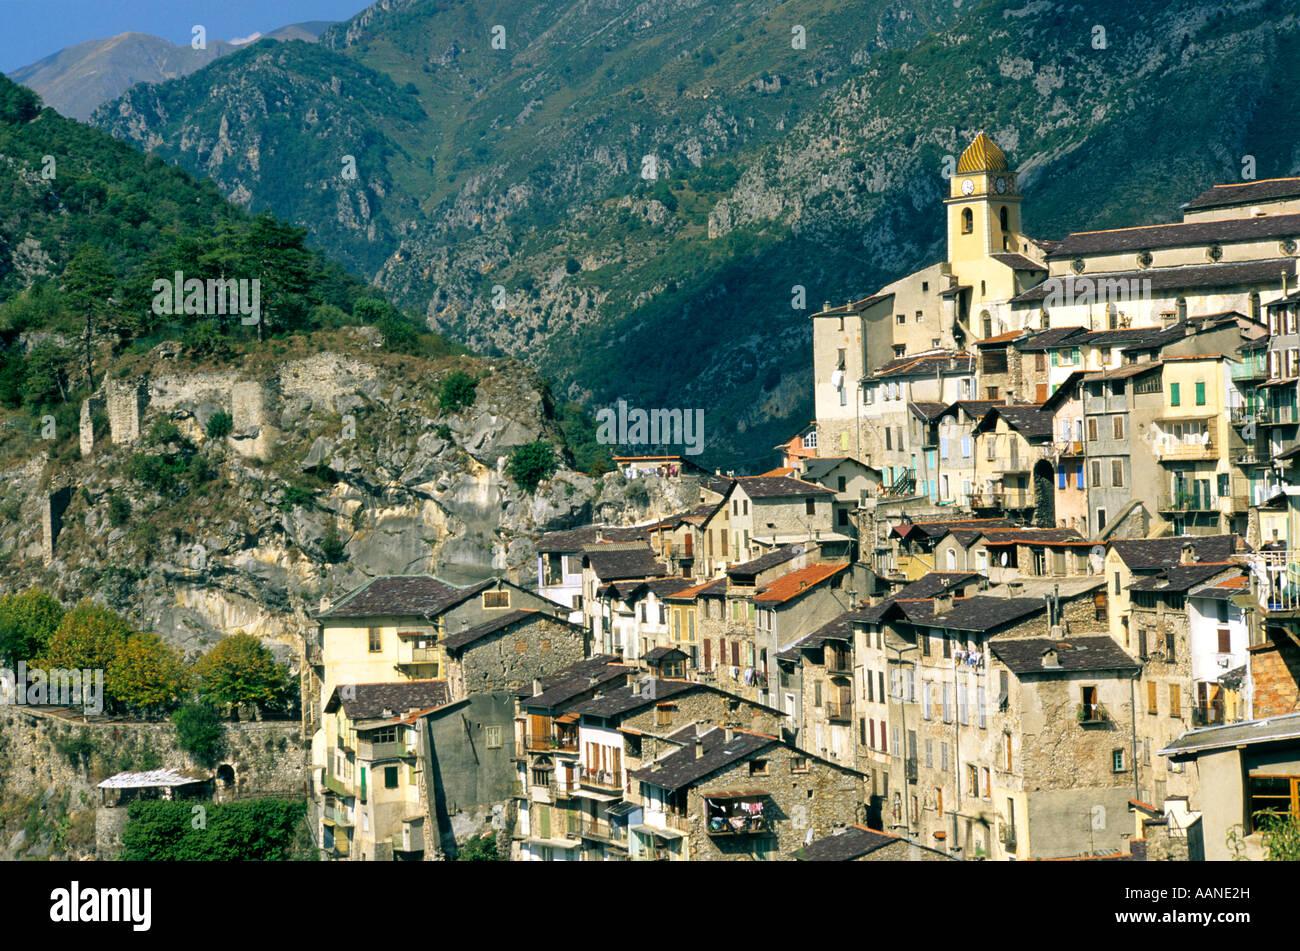 Village of Saorgue, Alpes-Maritimes, France, Europe - Stock Image